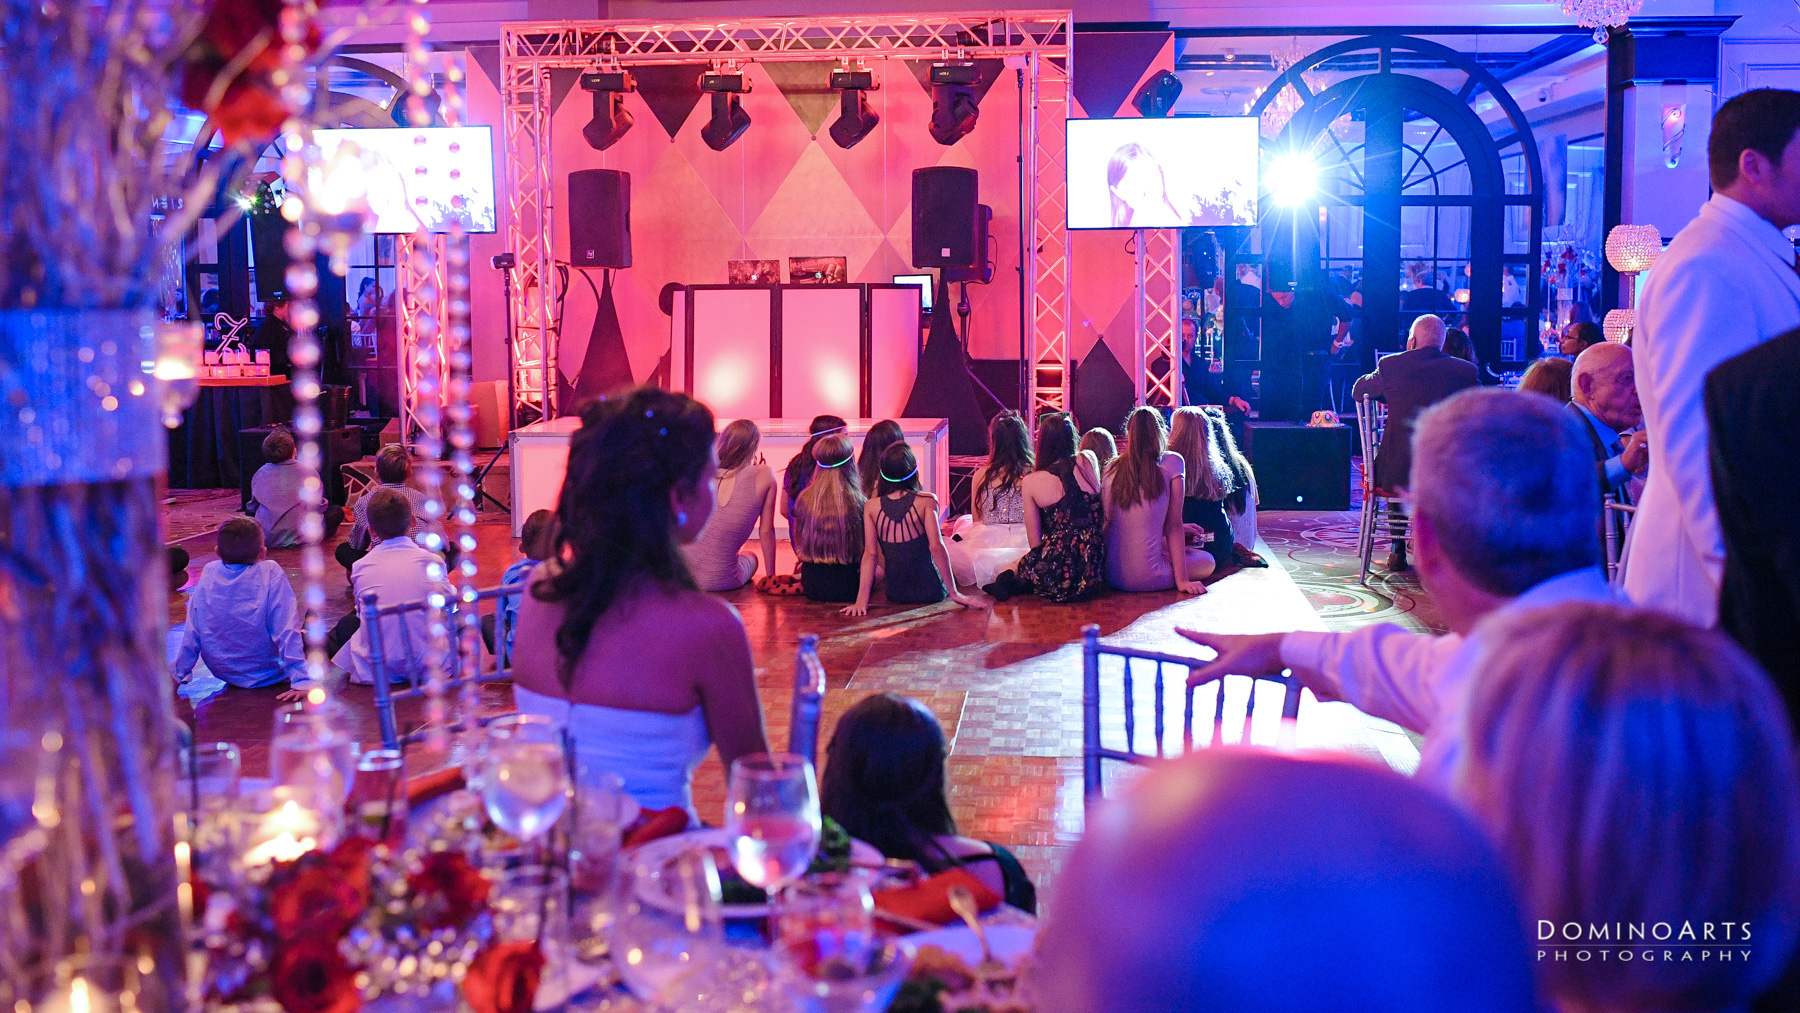 party pictures at Temple Beth El Mitzvah, Boca Raton Mitzvah